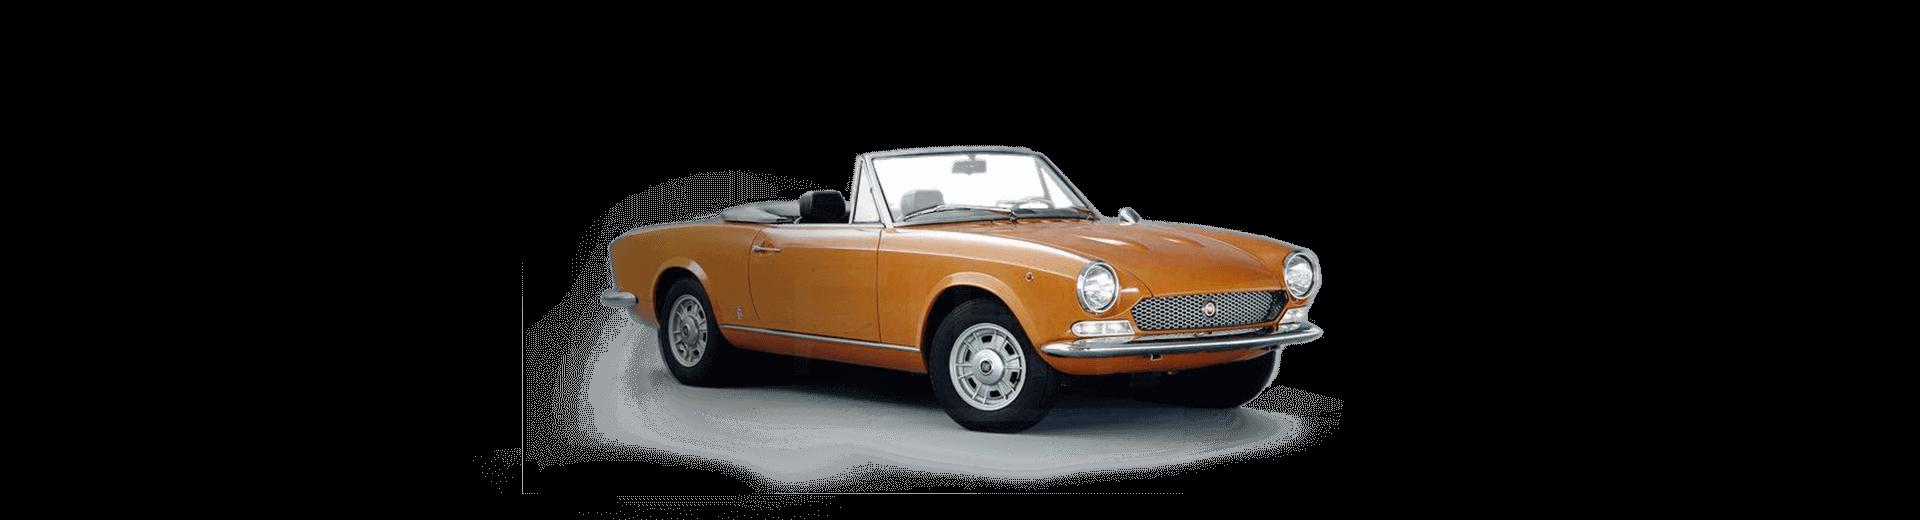 Fiat Official Website Alfa 159 Workshop Manual Download